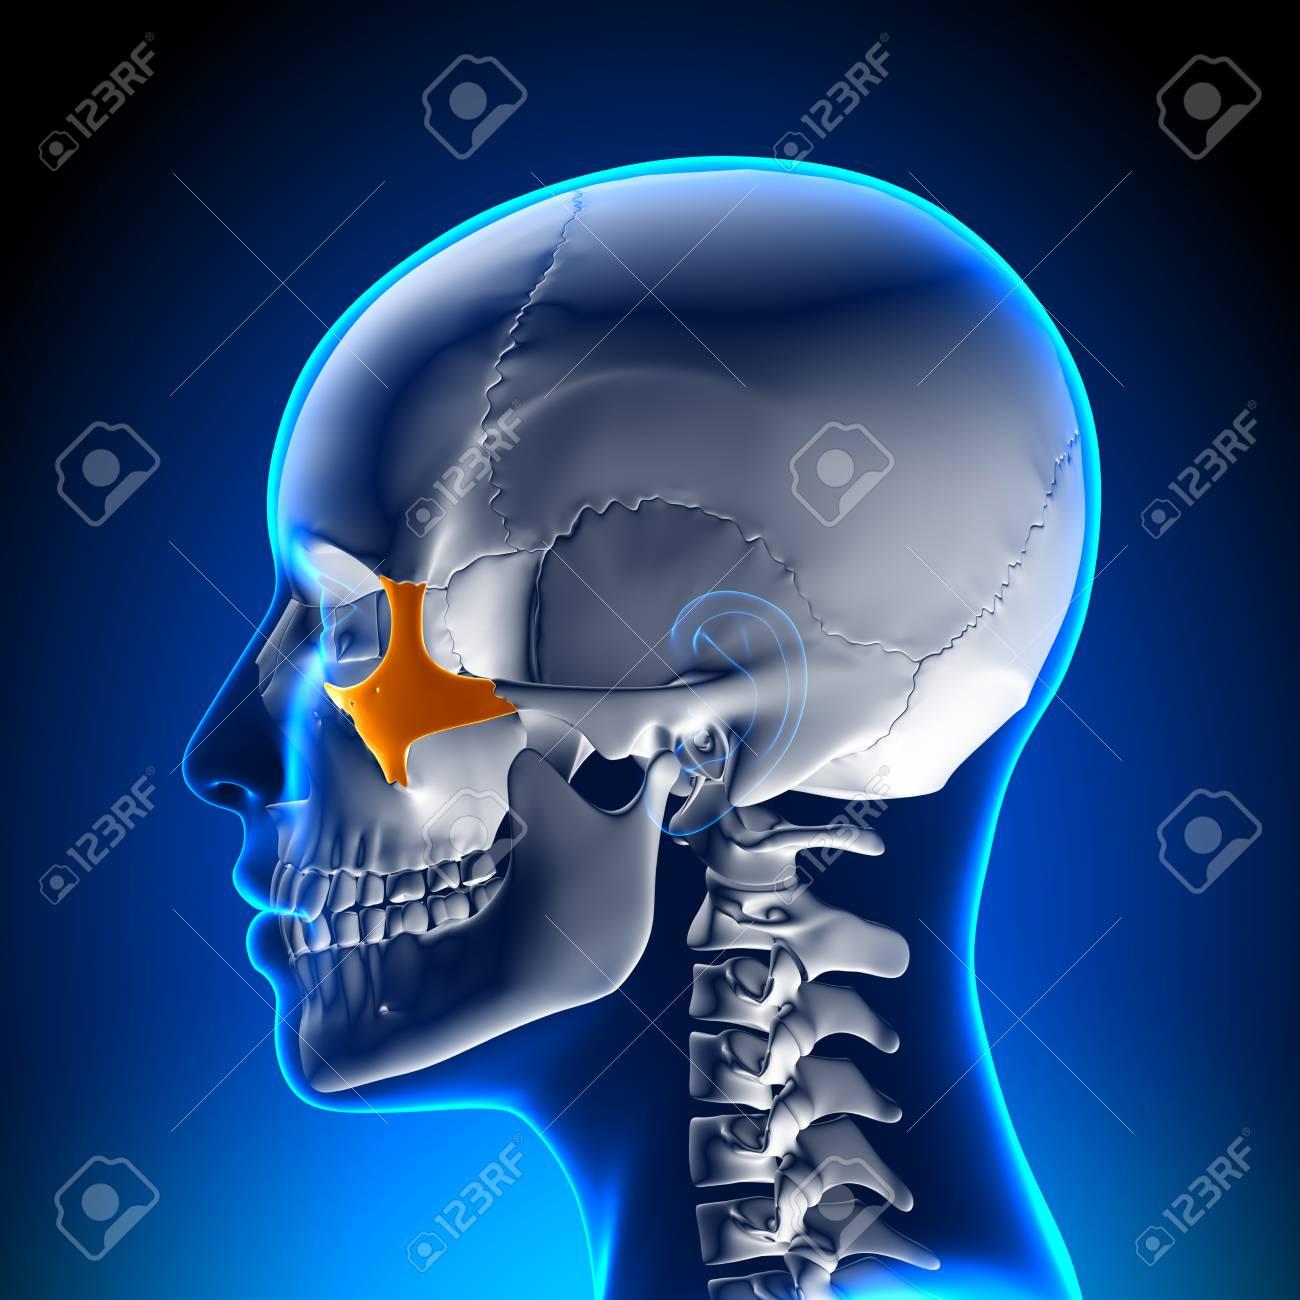 Female Zygomatic Bone - Skull / Cranium Anatomy Stock Photo, Picture ...